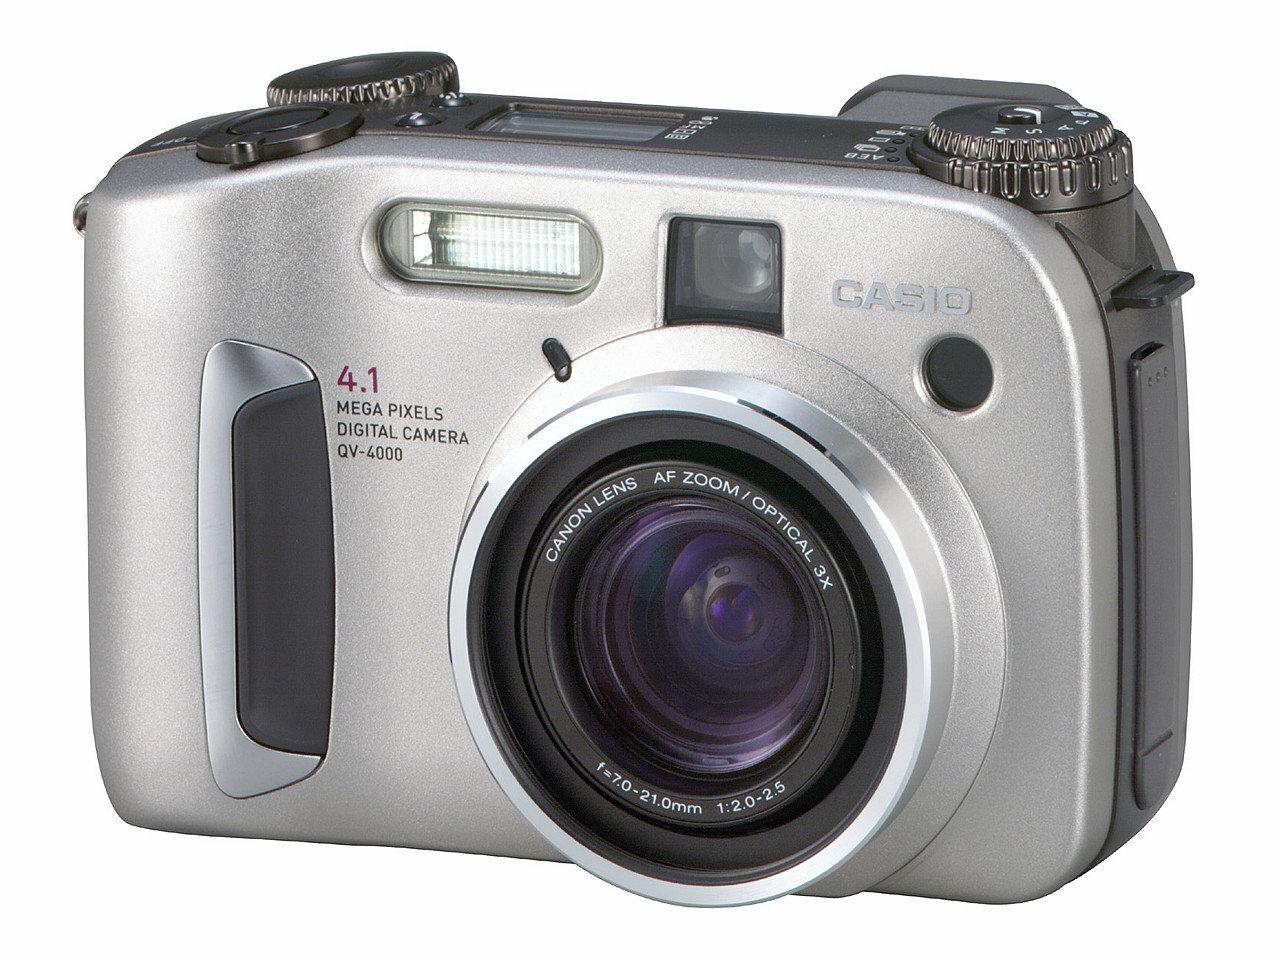 Фотоаппарат CASIO QV-4000